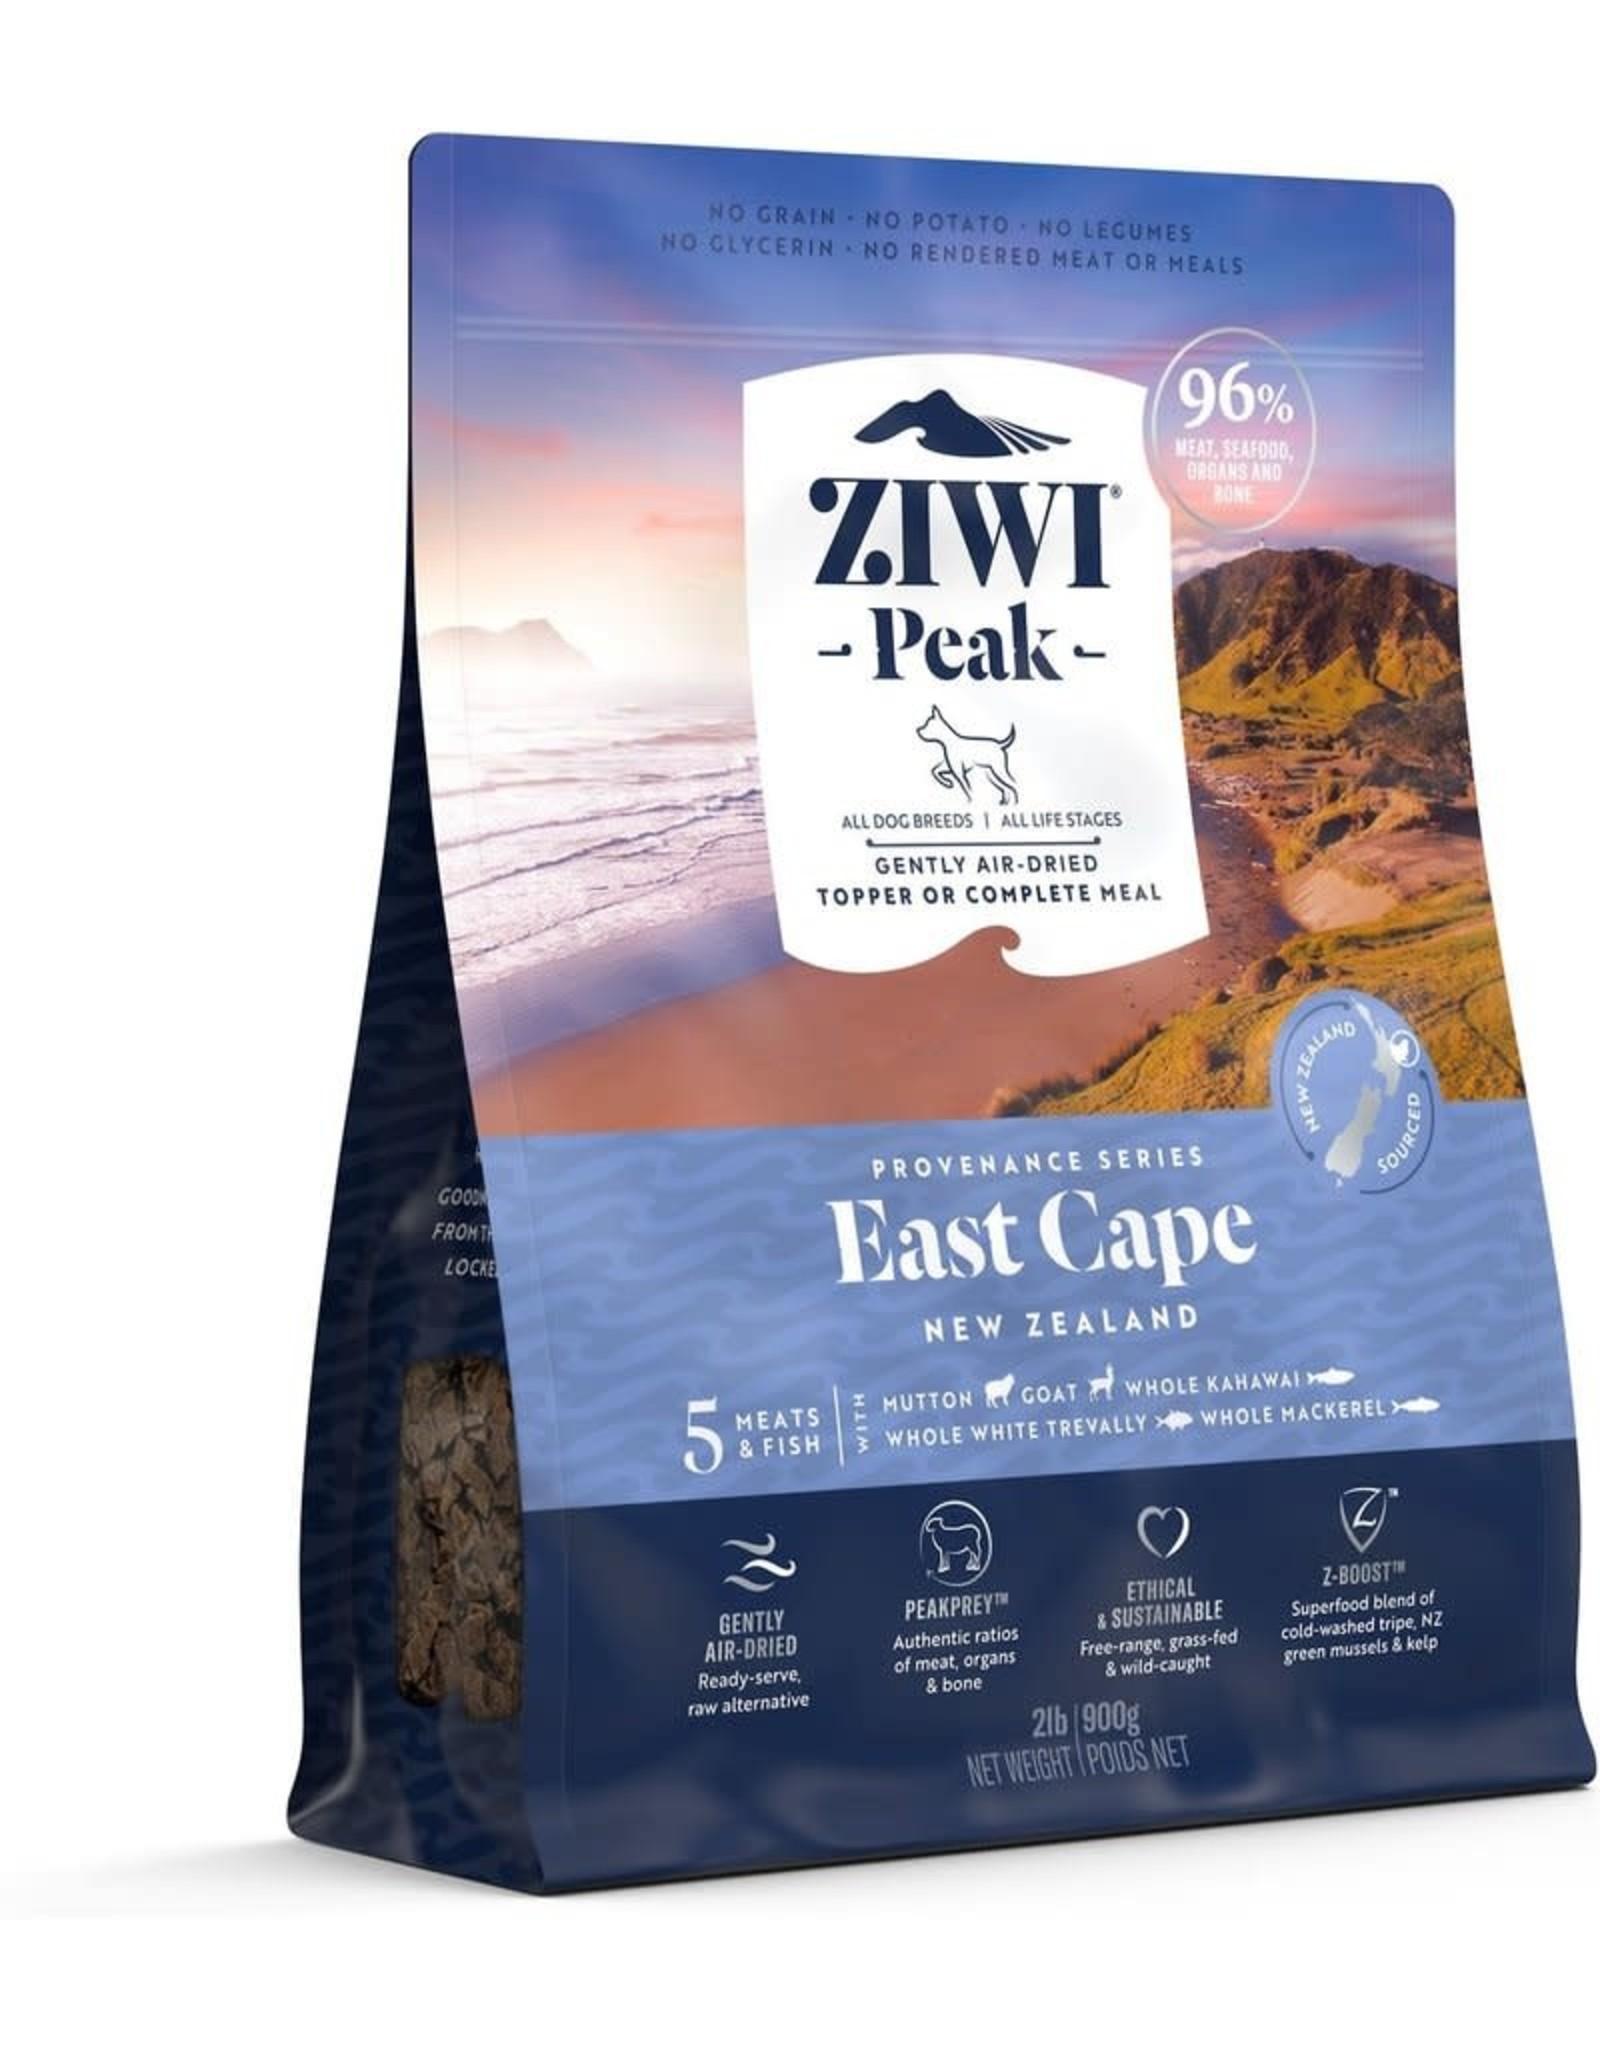 Ziwi Peak Ziwi Peak East Cape 5 Meats & Fish 4lbs